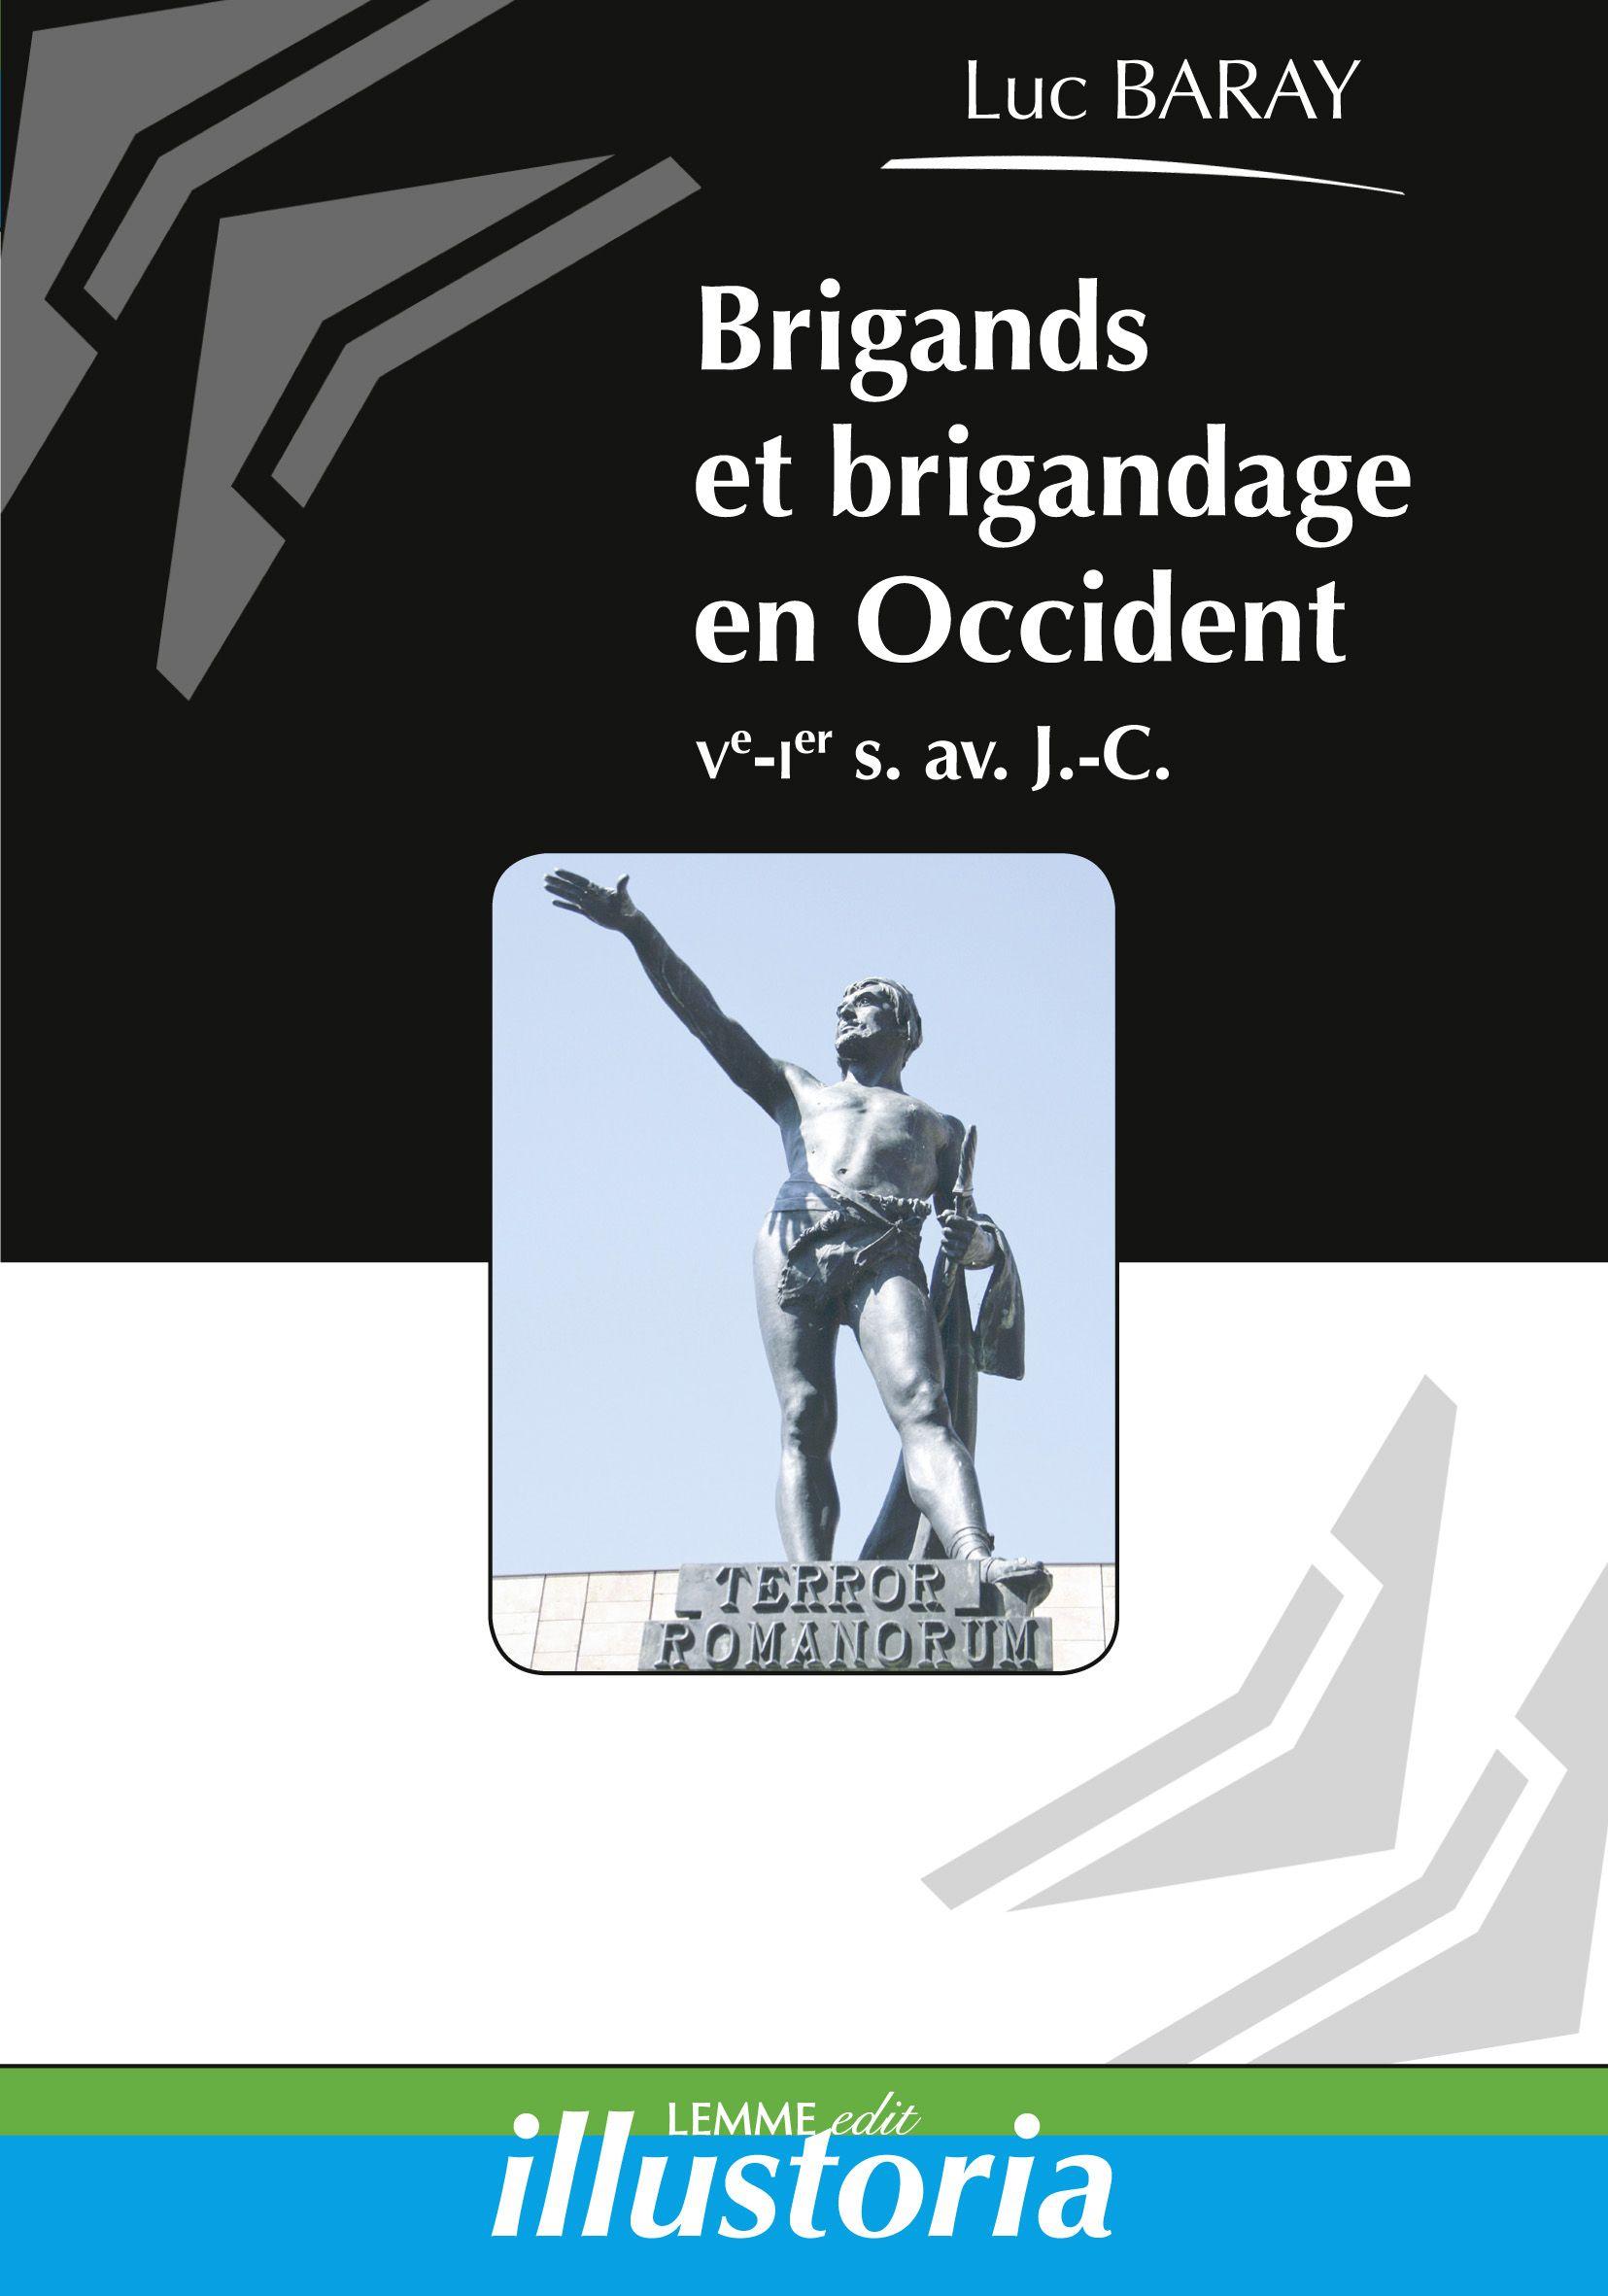 Brigands et brigandage en Occident, Luc Baray, ouvrage histoire ancienne, histoire romaine, Rome, Barbares.